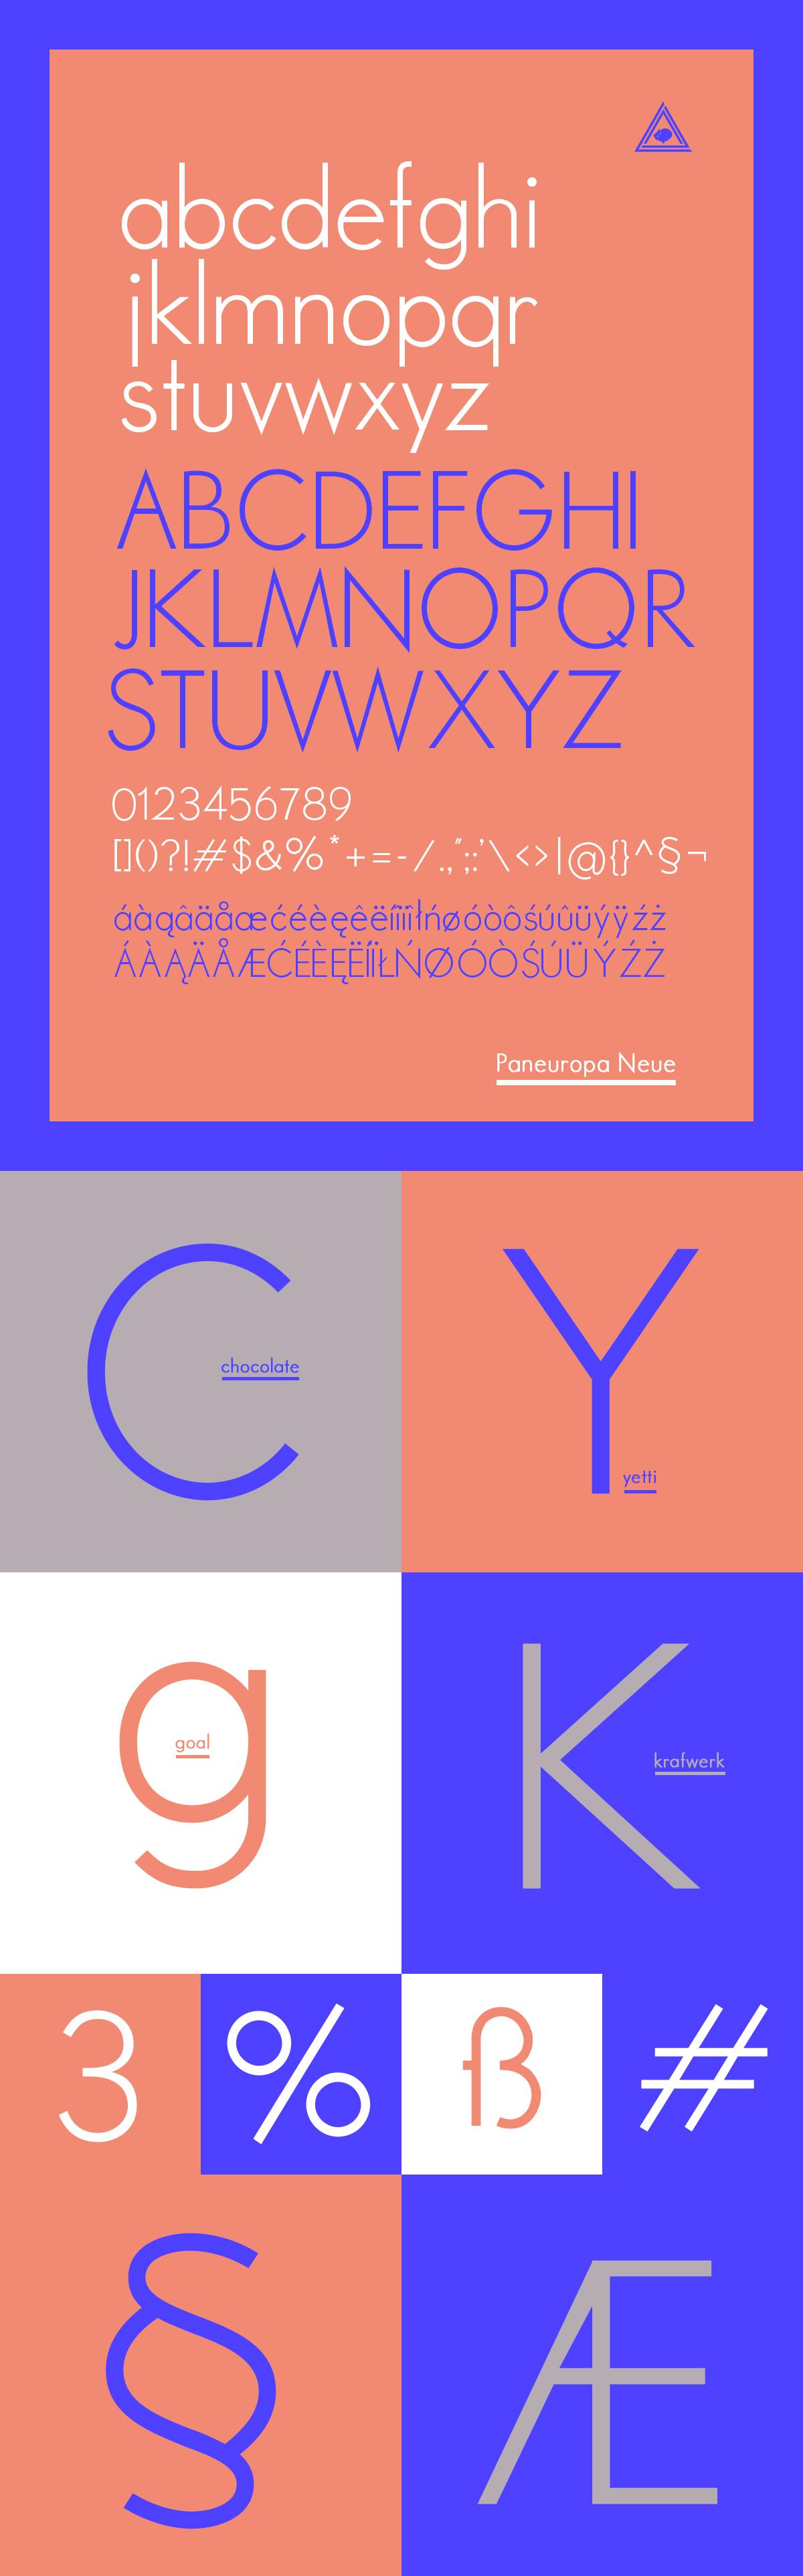 Free font font paneuropa neue typo type bojarczuk illcatdzn free typeface